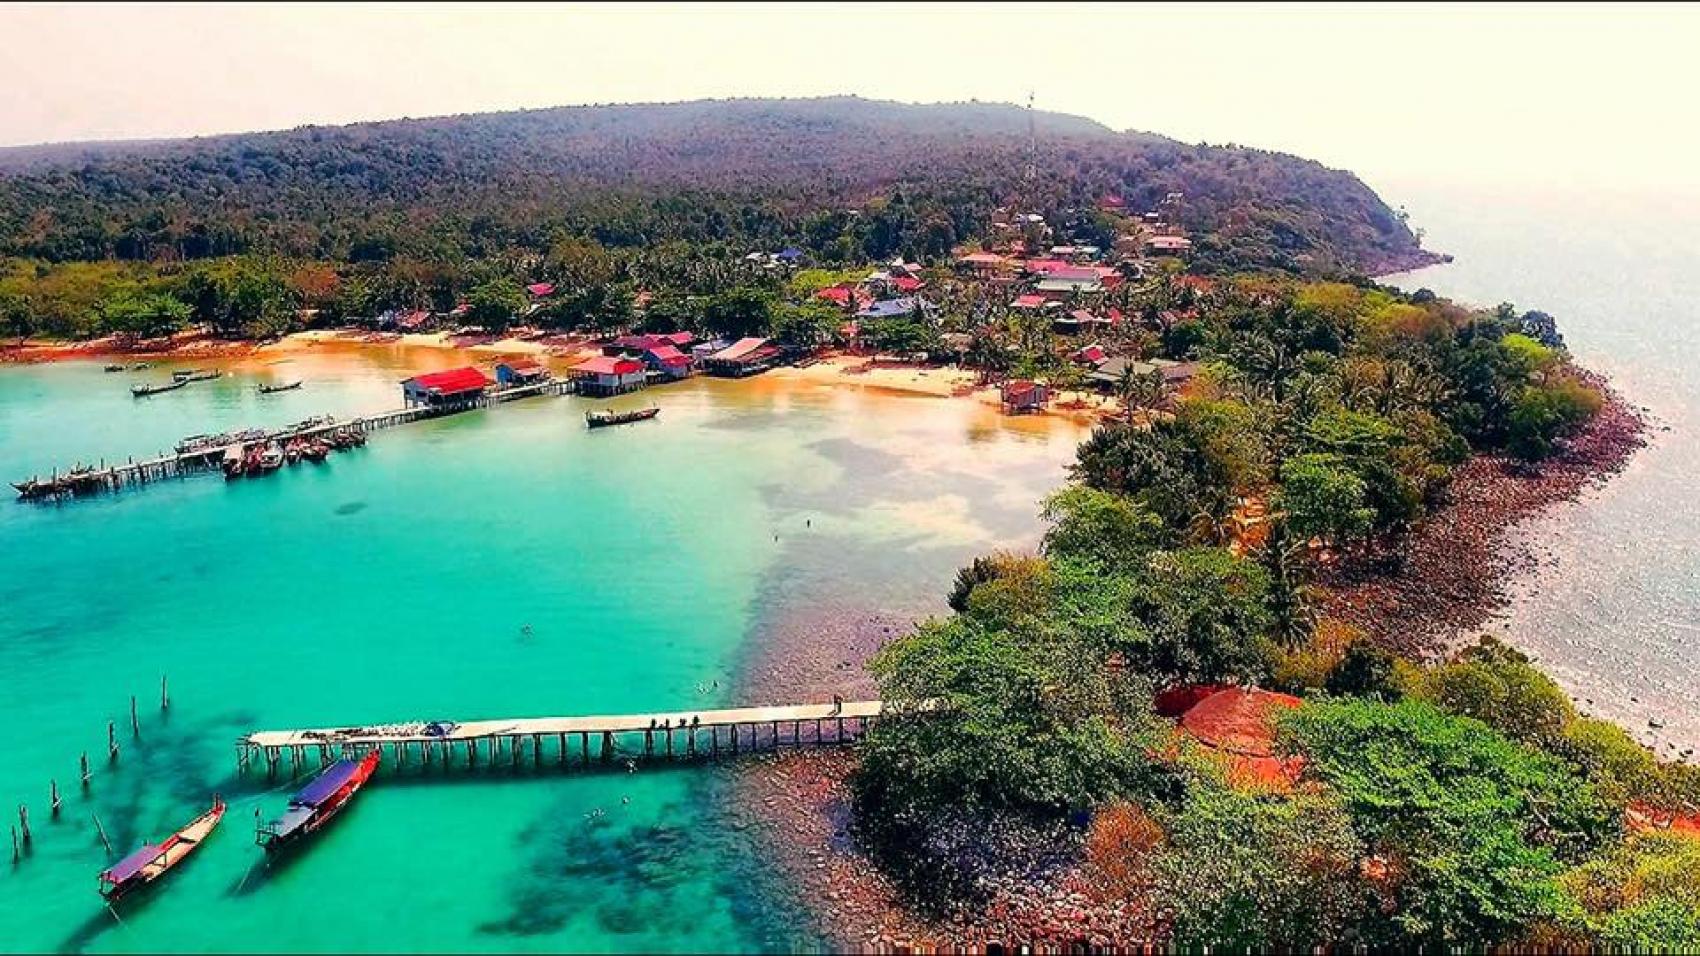 Aerial-shot-of-the-stunningly-beautiful-MPai-Bay.